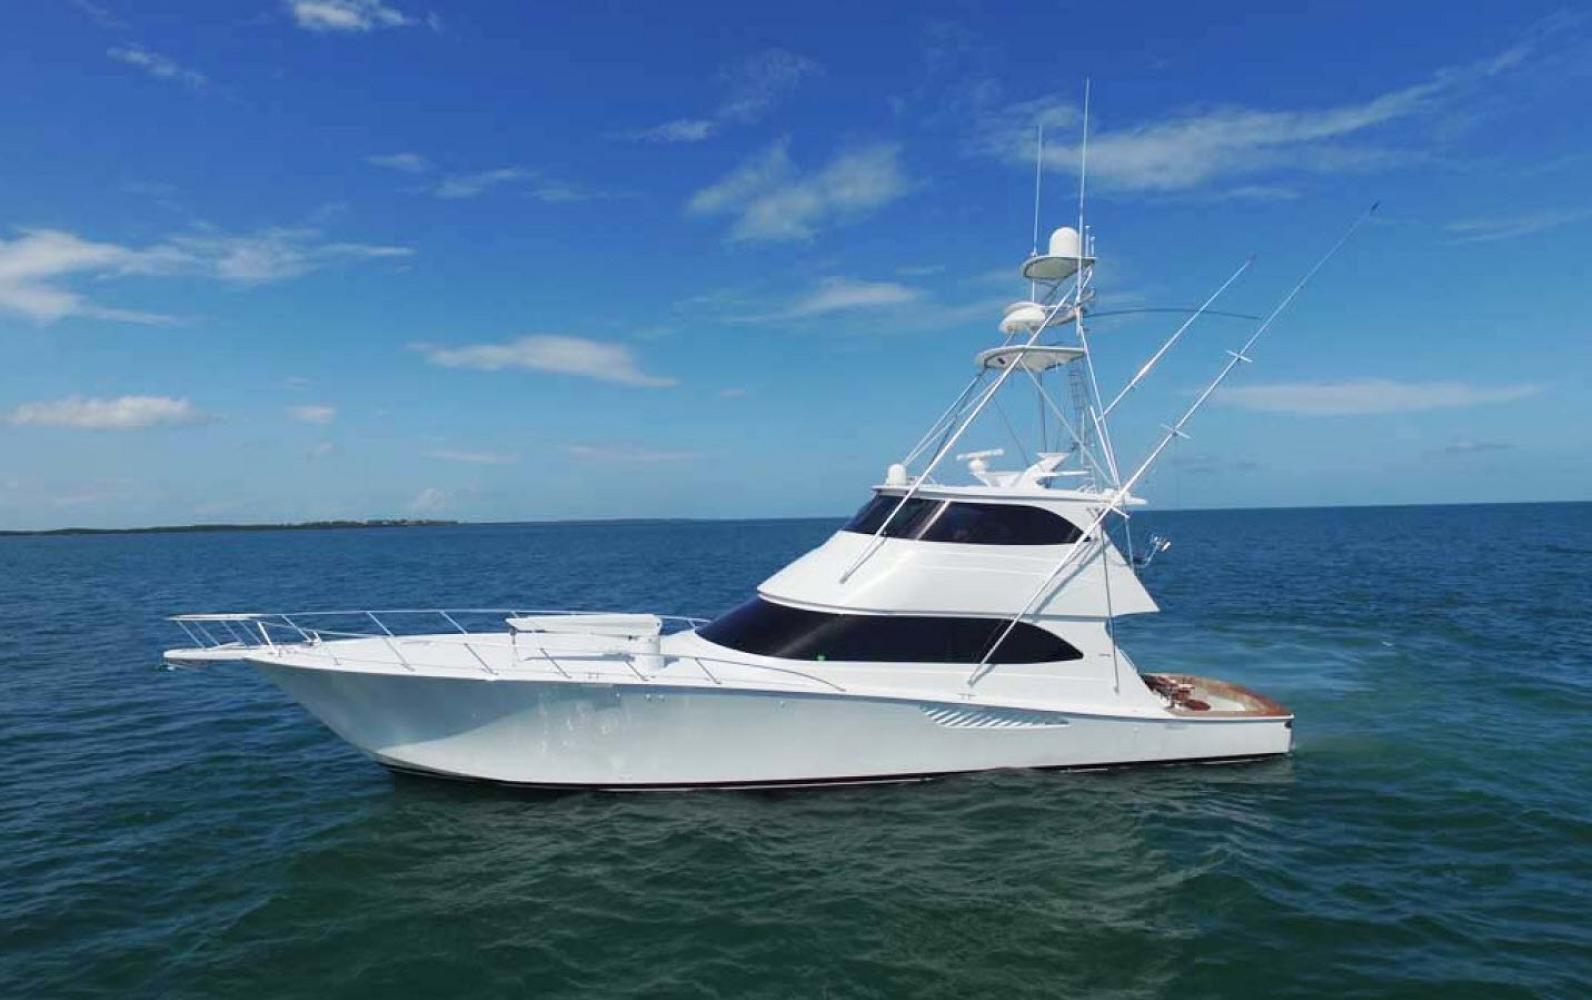 1c4d9124 Emeril Lagasse's 70' Viking Aldente Is Now For Sale   United Yacht Sales